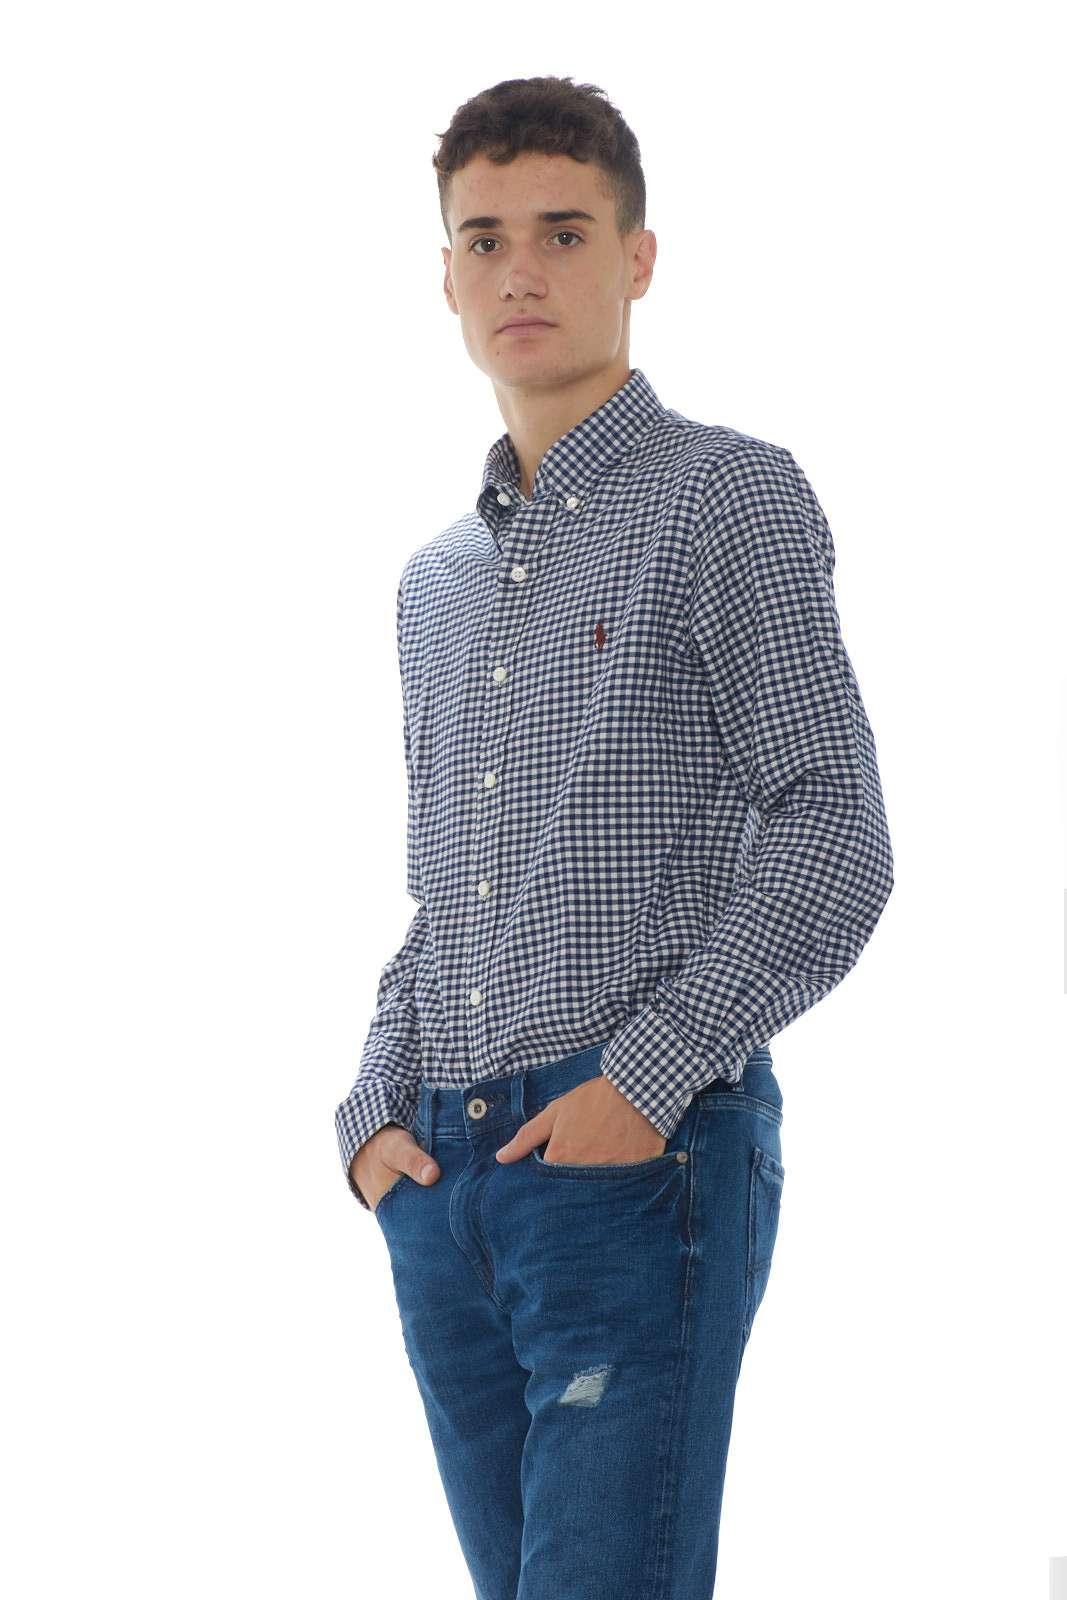 https://www.parmax.com/media/catalog/product/a/i/AI-outlet_parmax-camicia-uomo-Ralph-Lauren-710767420001-B_1.jpg